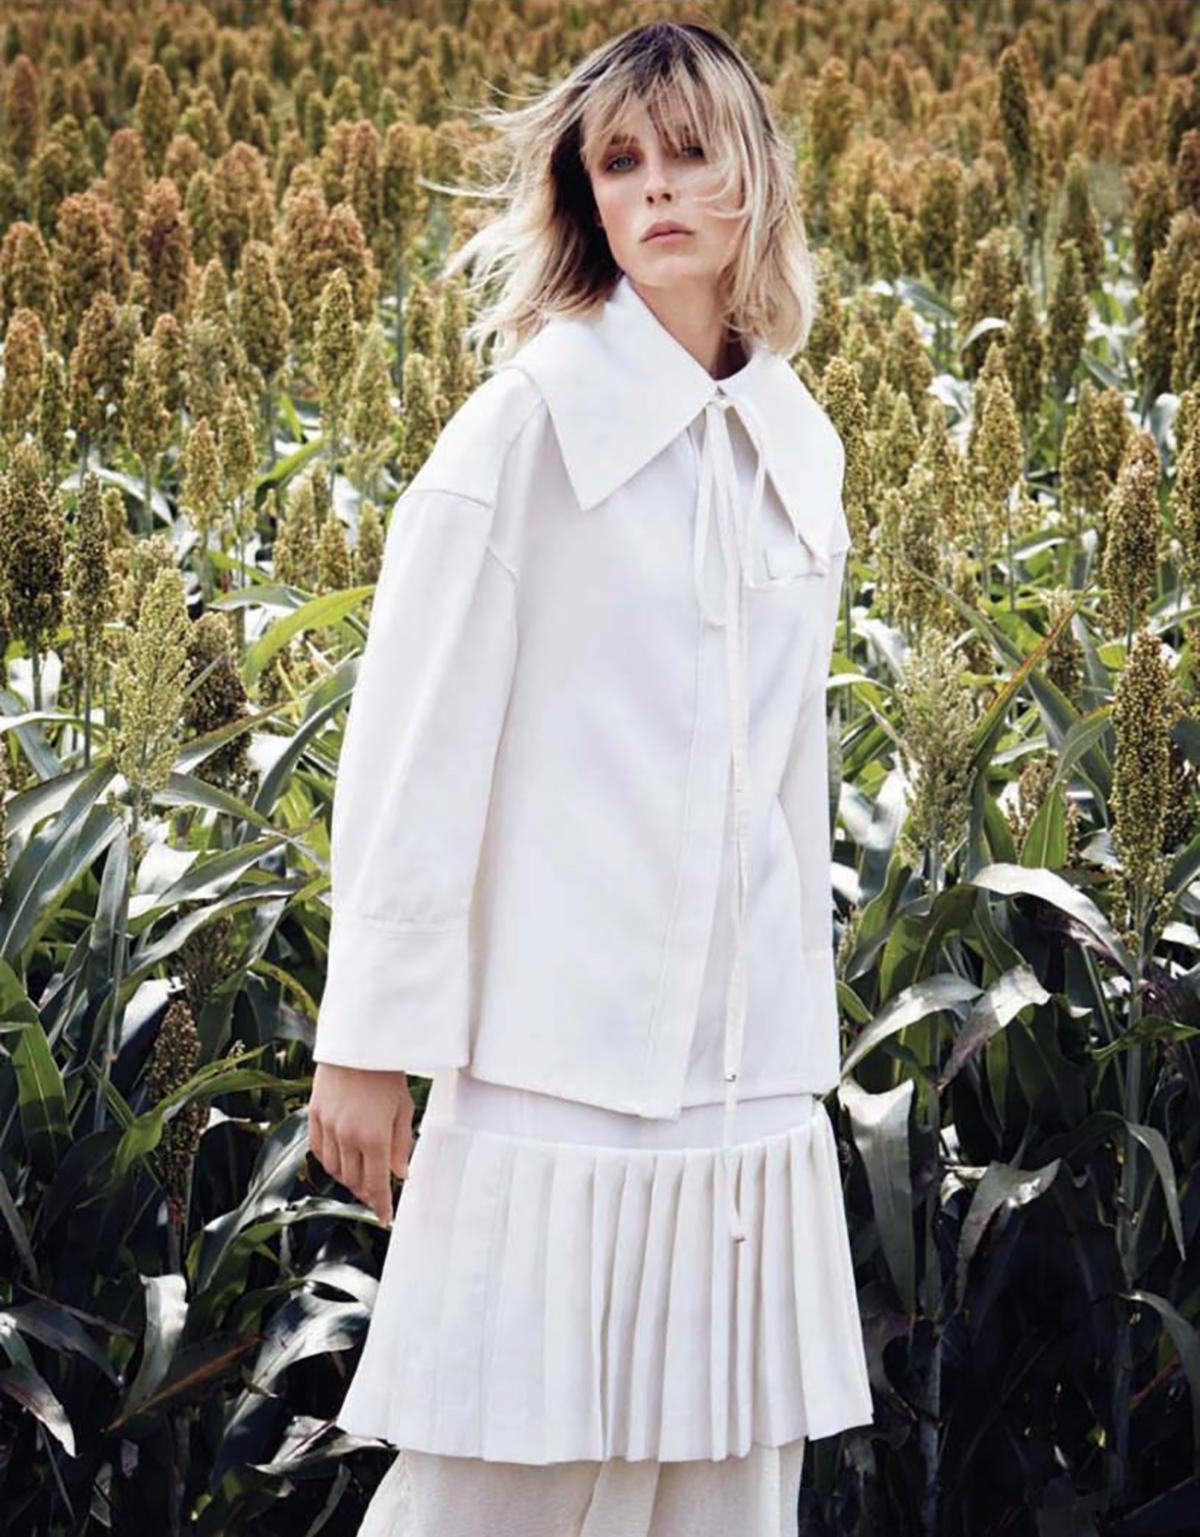 Edie-Campbell-Patrick-Demarchelier-Vogue-China-Dec-2017- (6).jpg